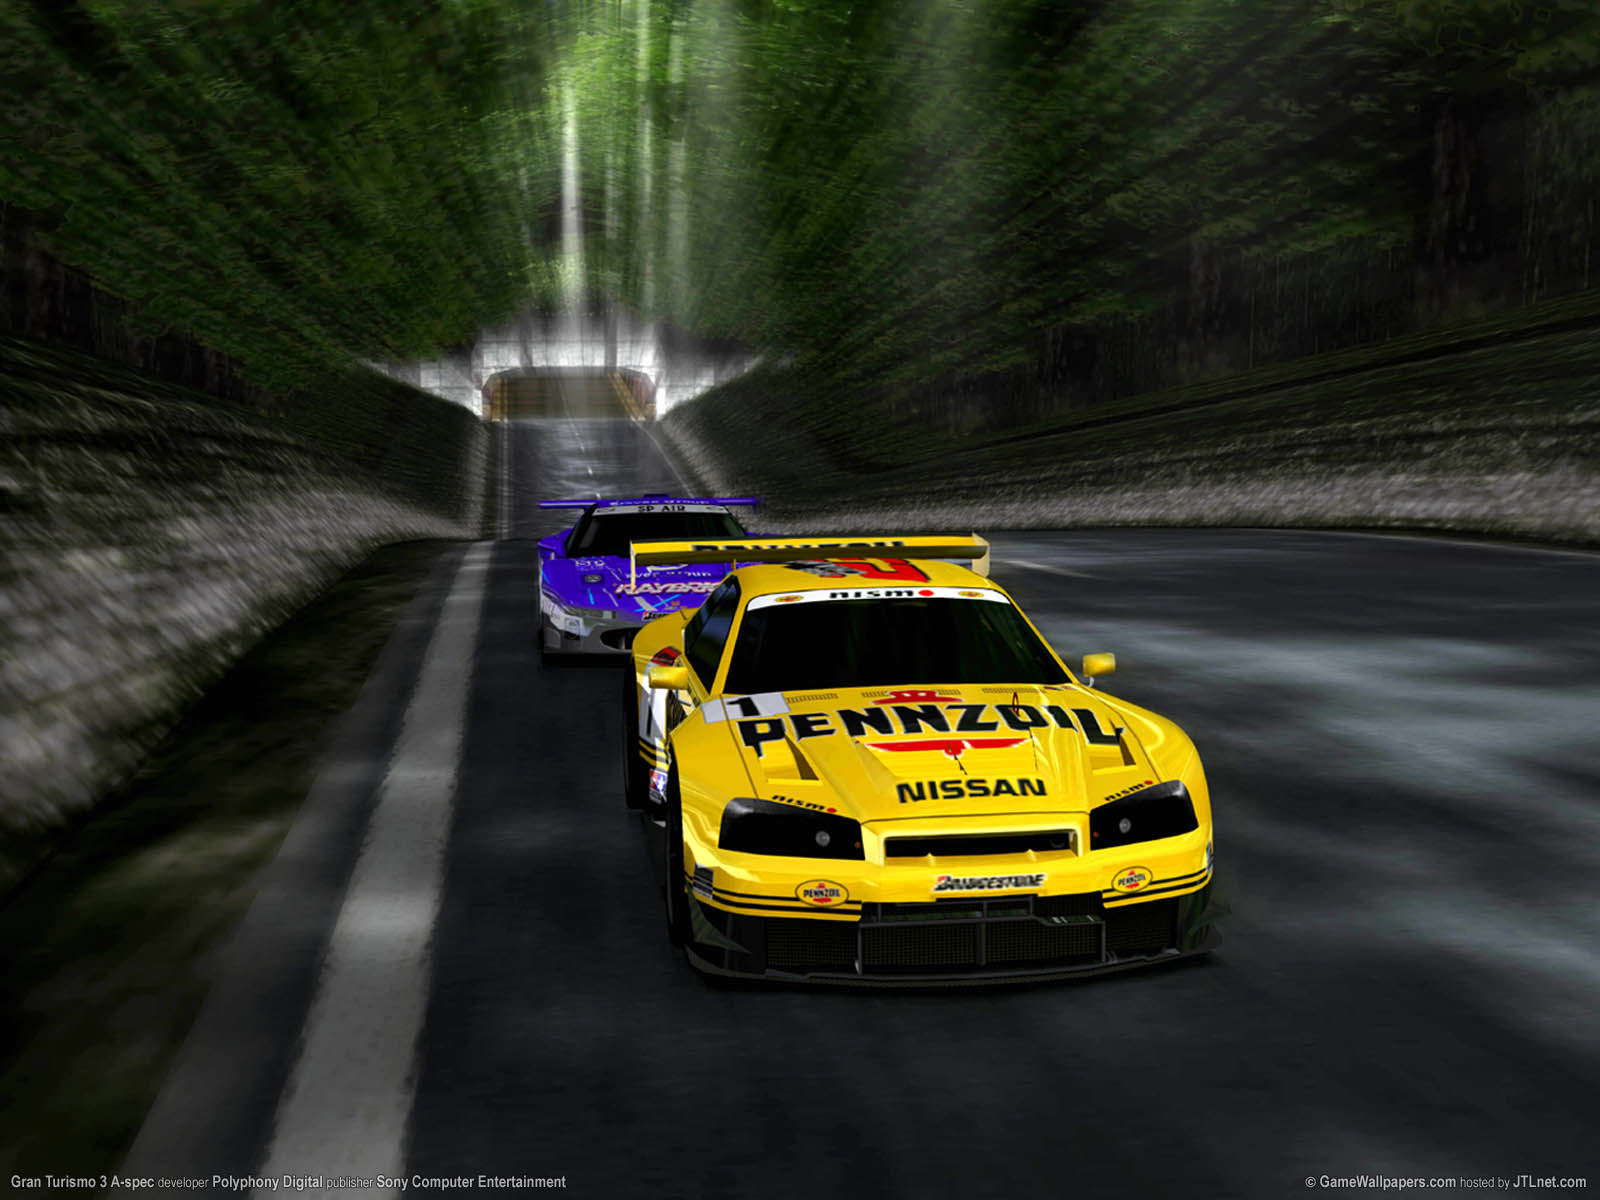 Gran Turismo 3 A-spec Hintergrundbild 07 1600x1200